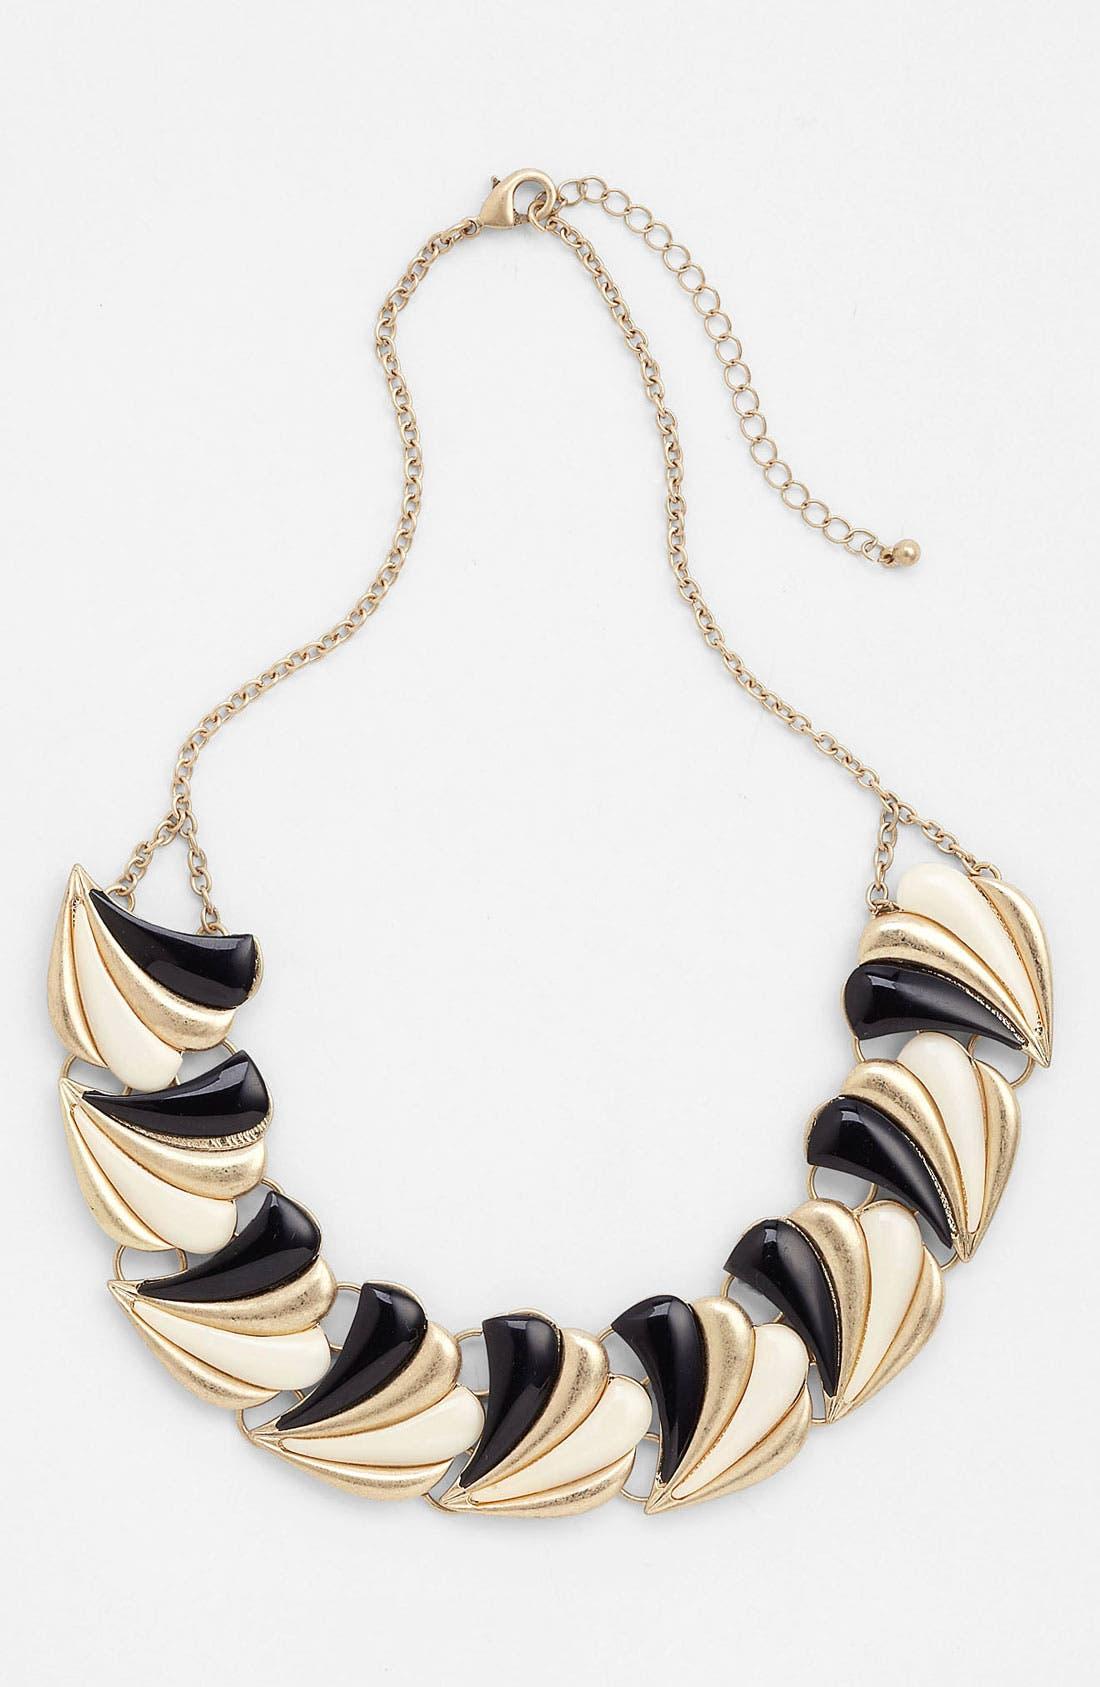 Main Image - Panacea Black & White Collar Necklace